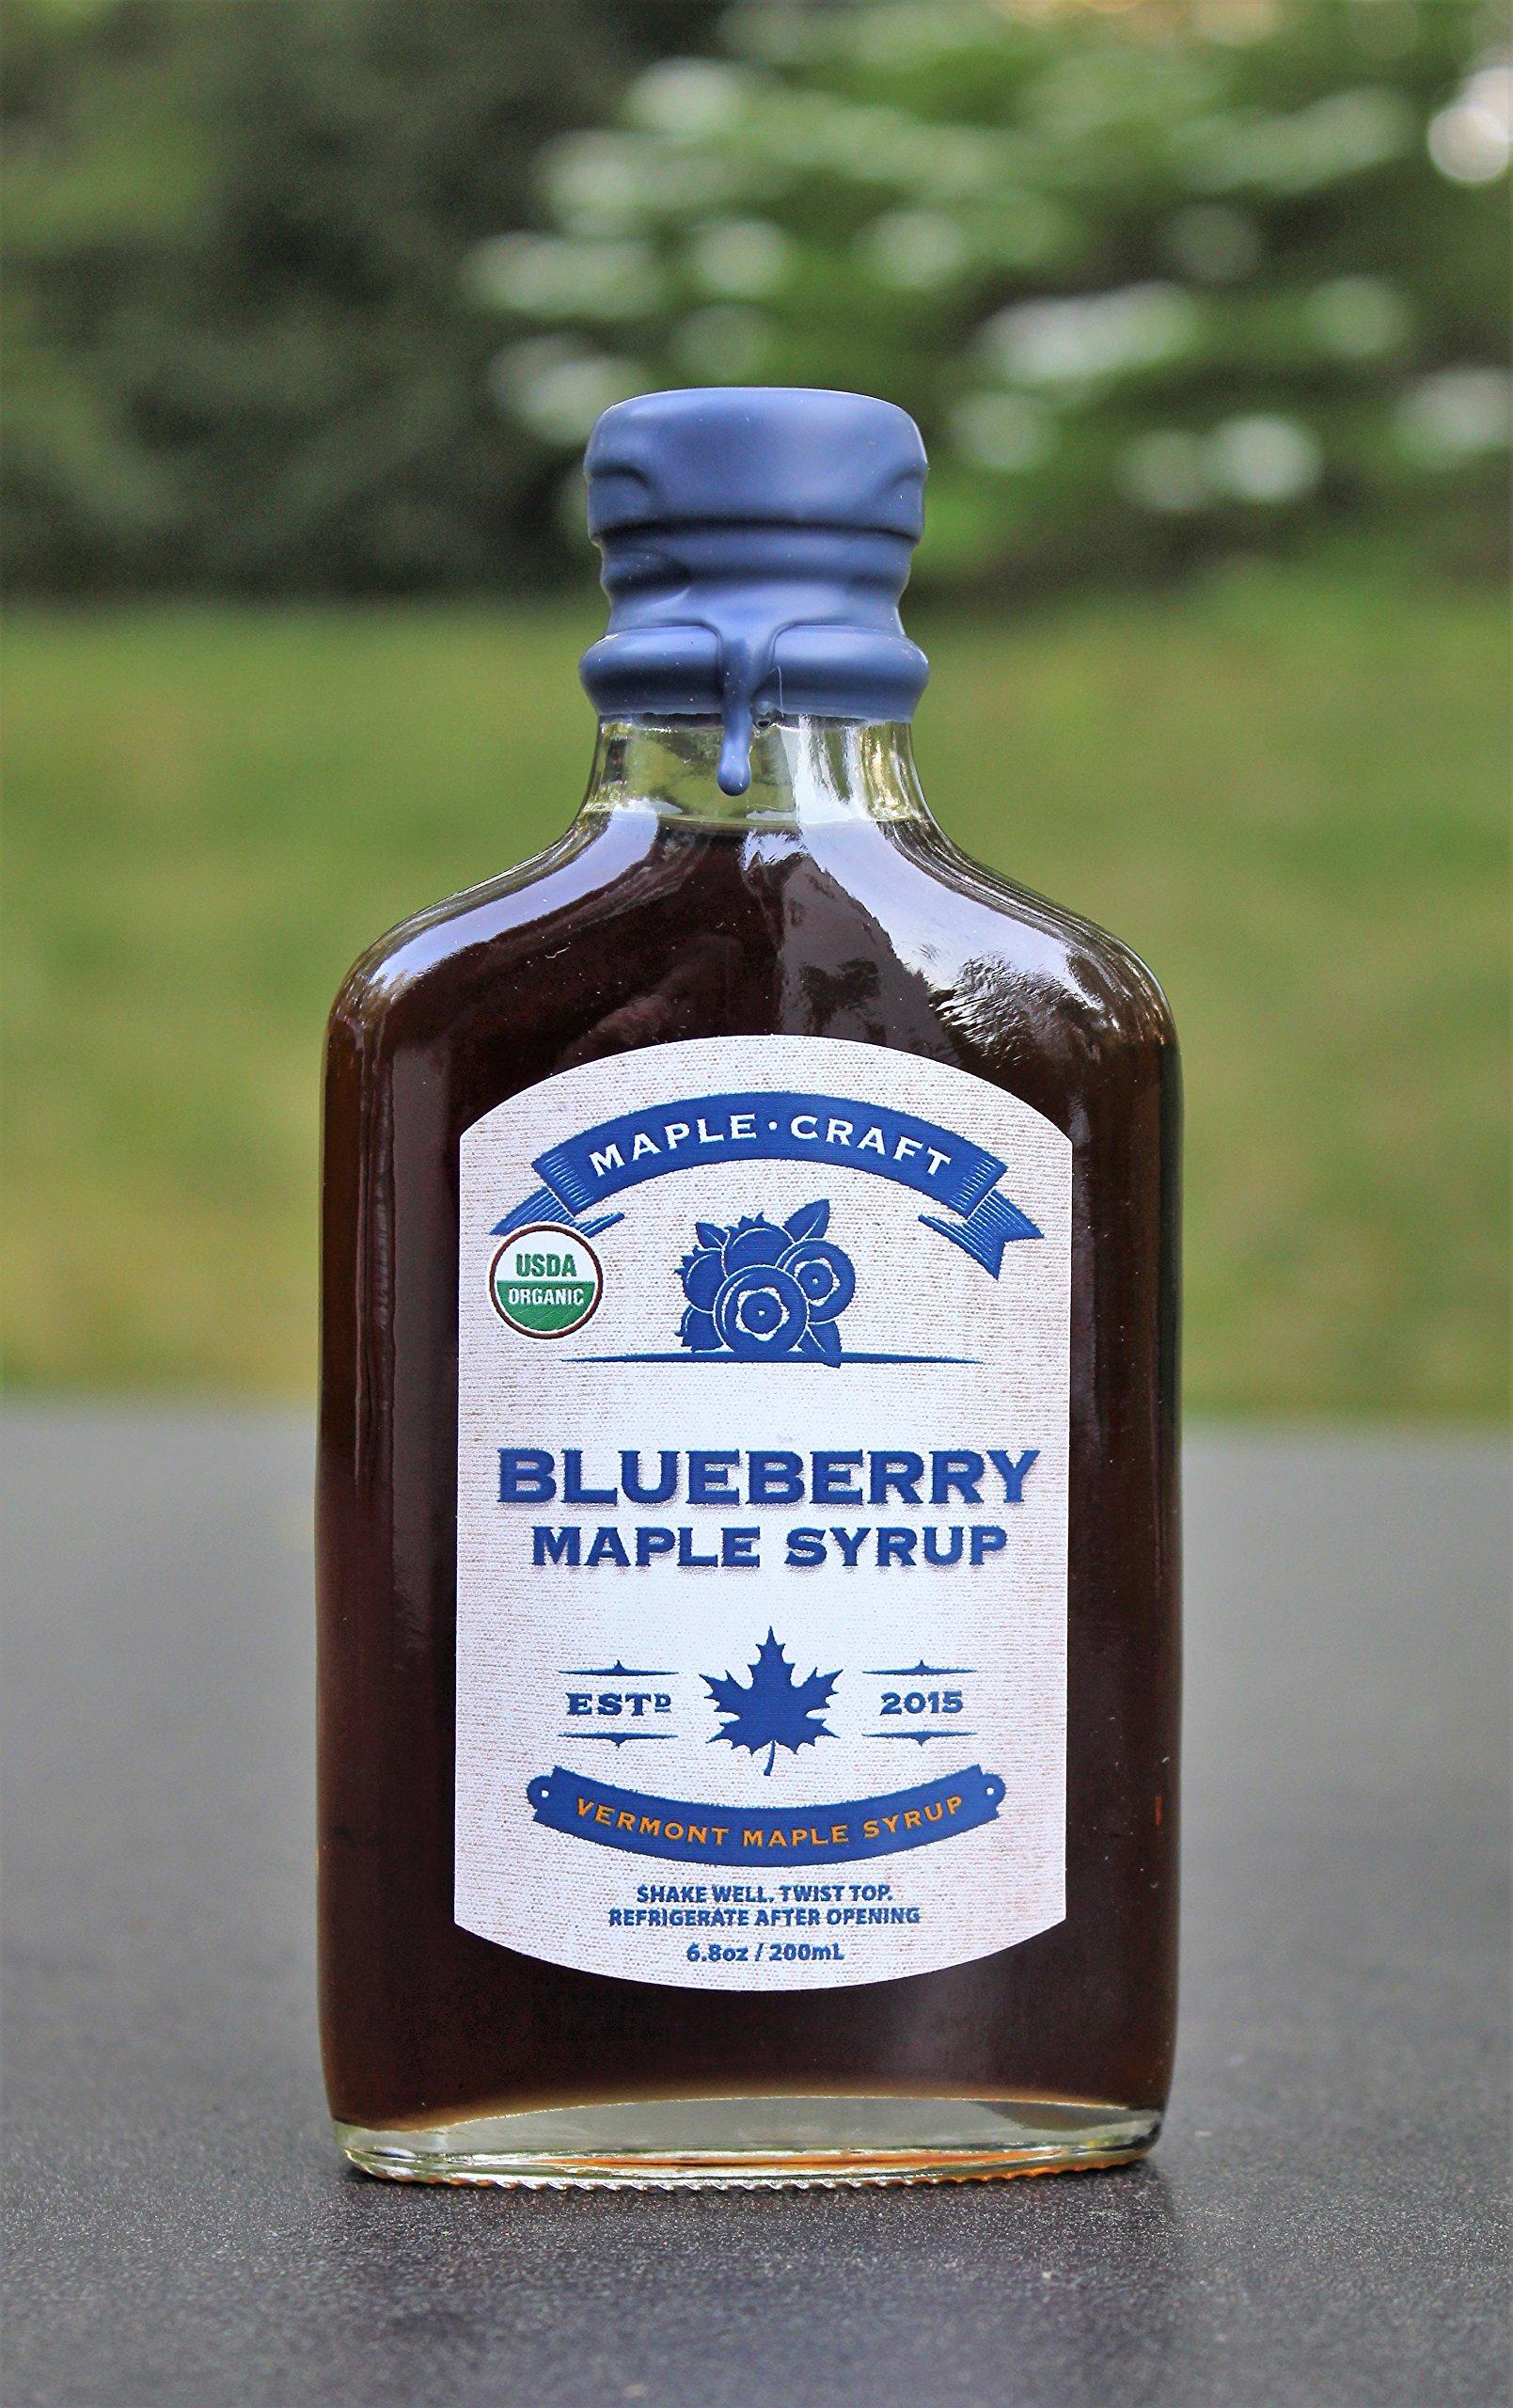 Maple Craft Syrup - Organic Blueberry, 200mL